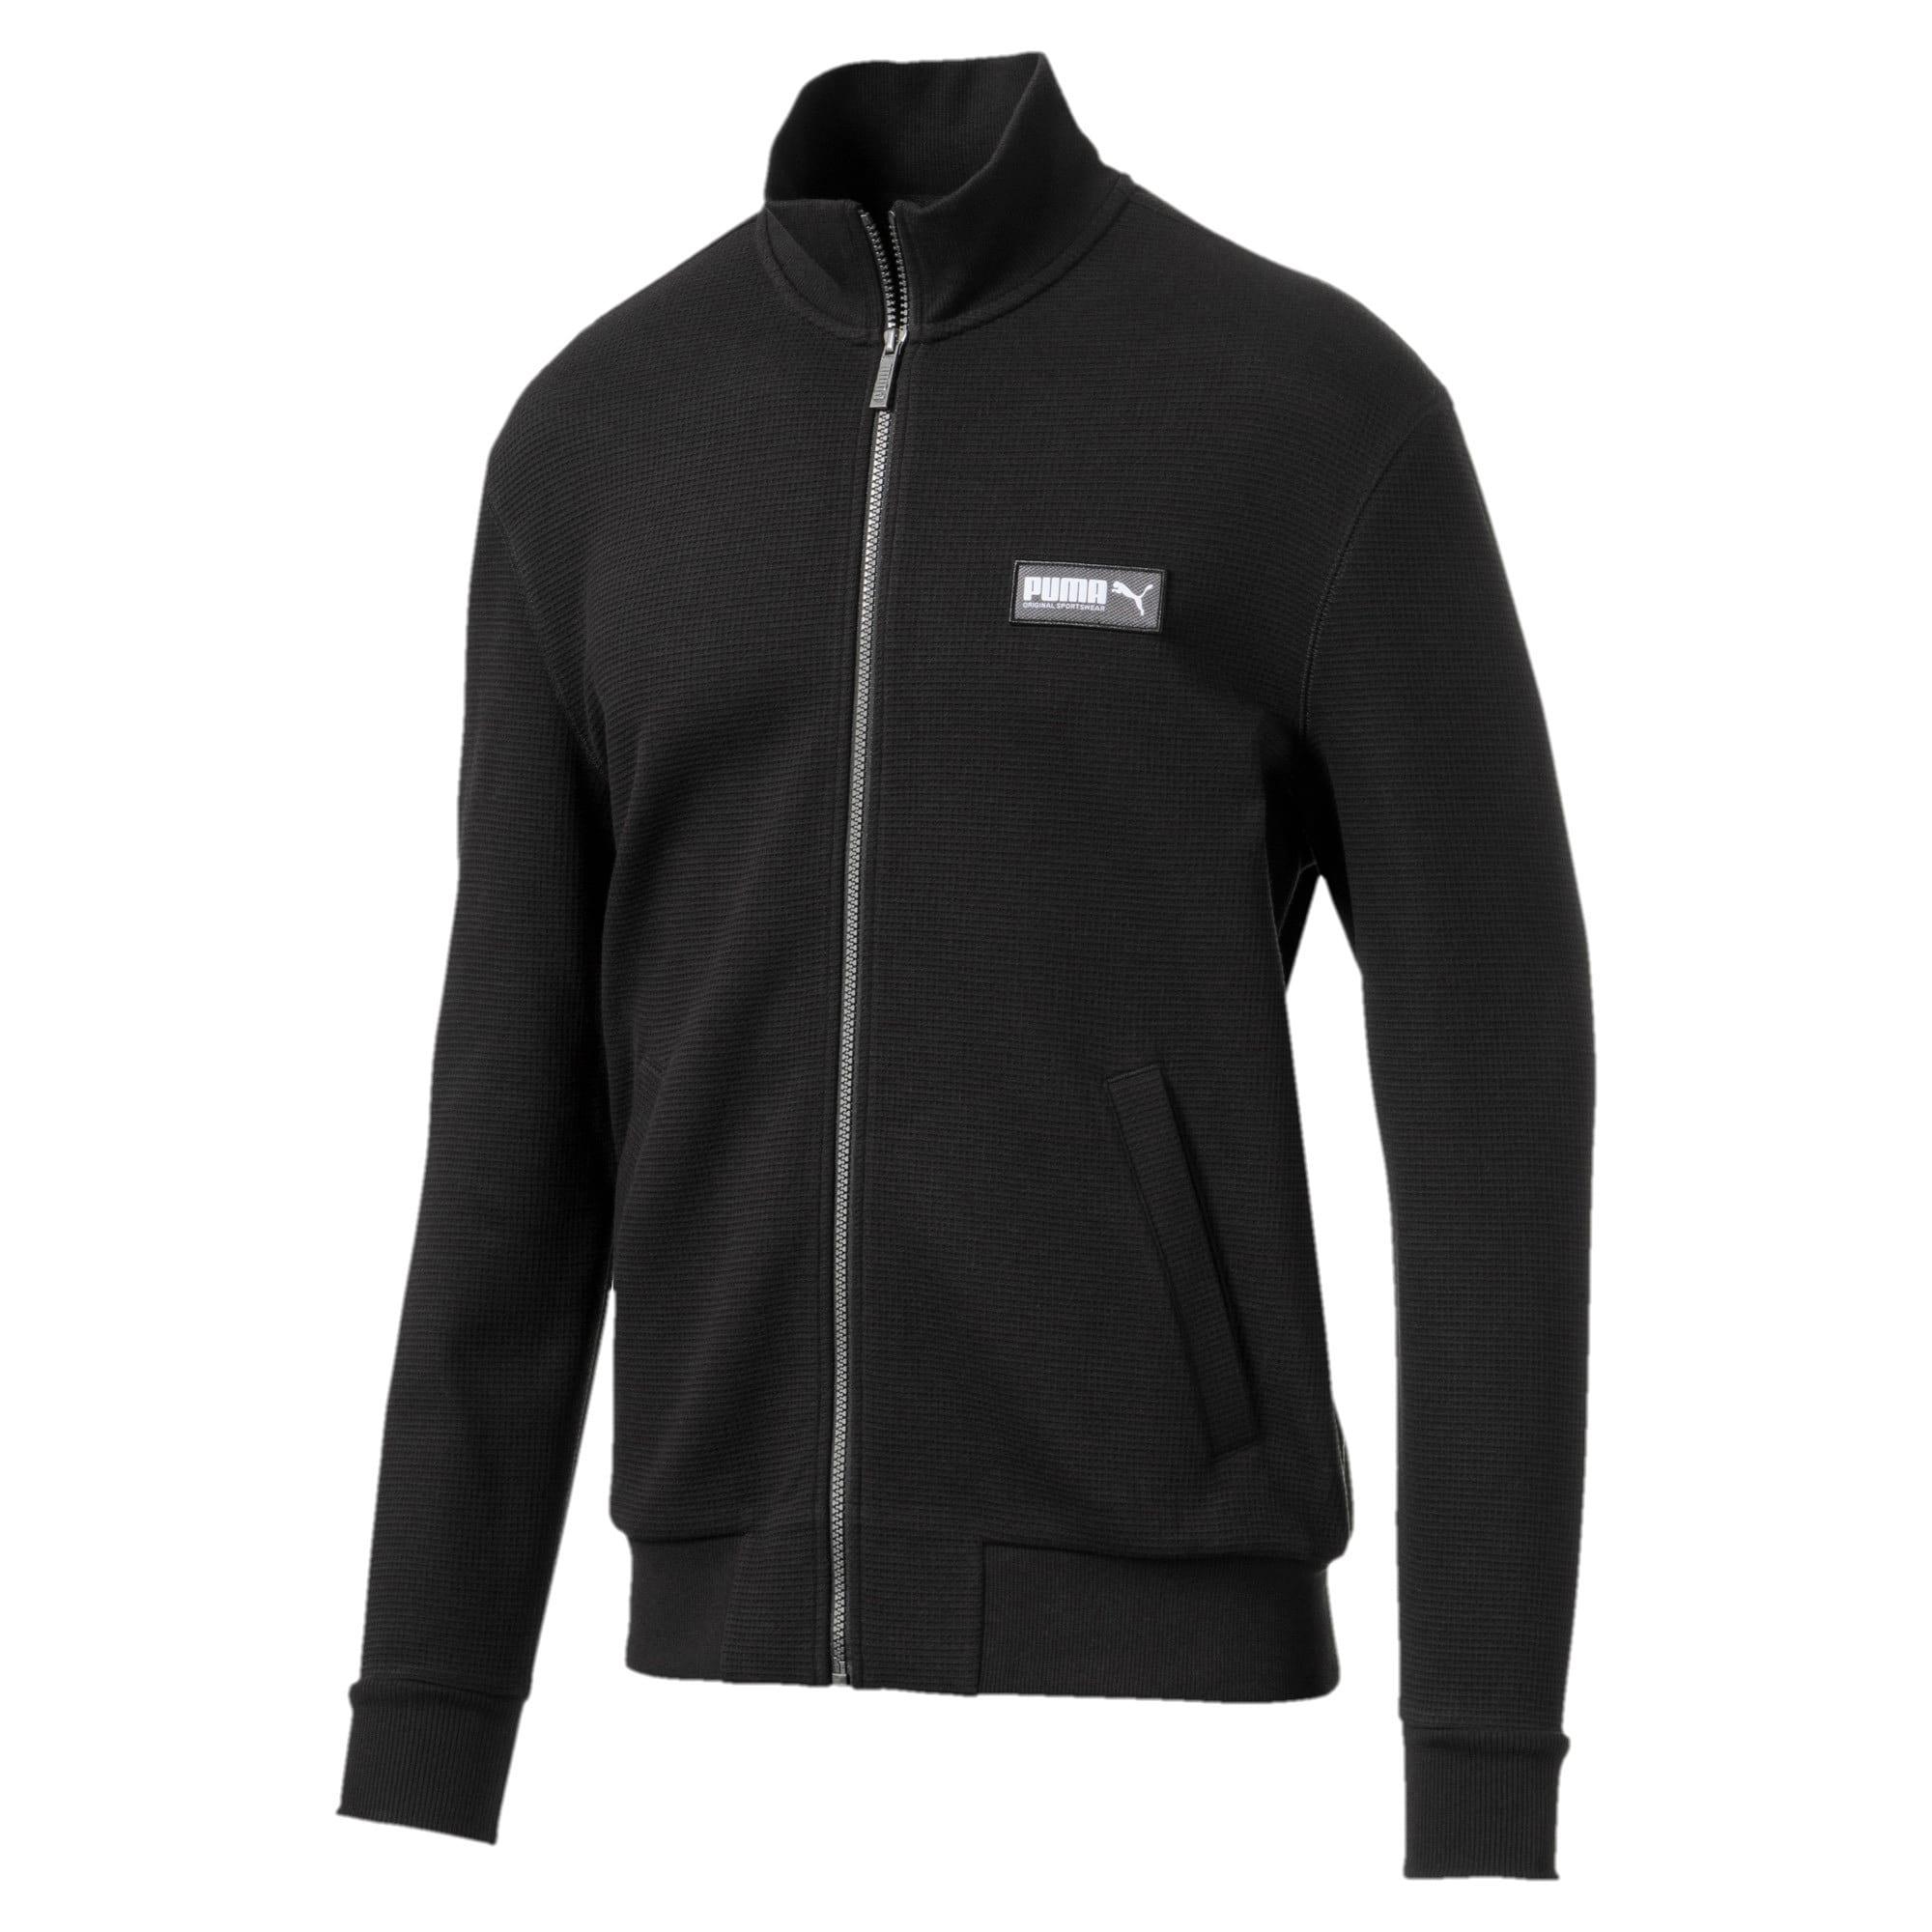 Thumbnail 4 of Fusion Men's Jacket, Puma Black, medium